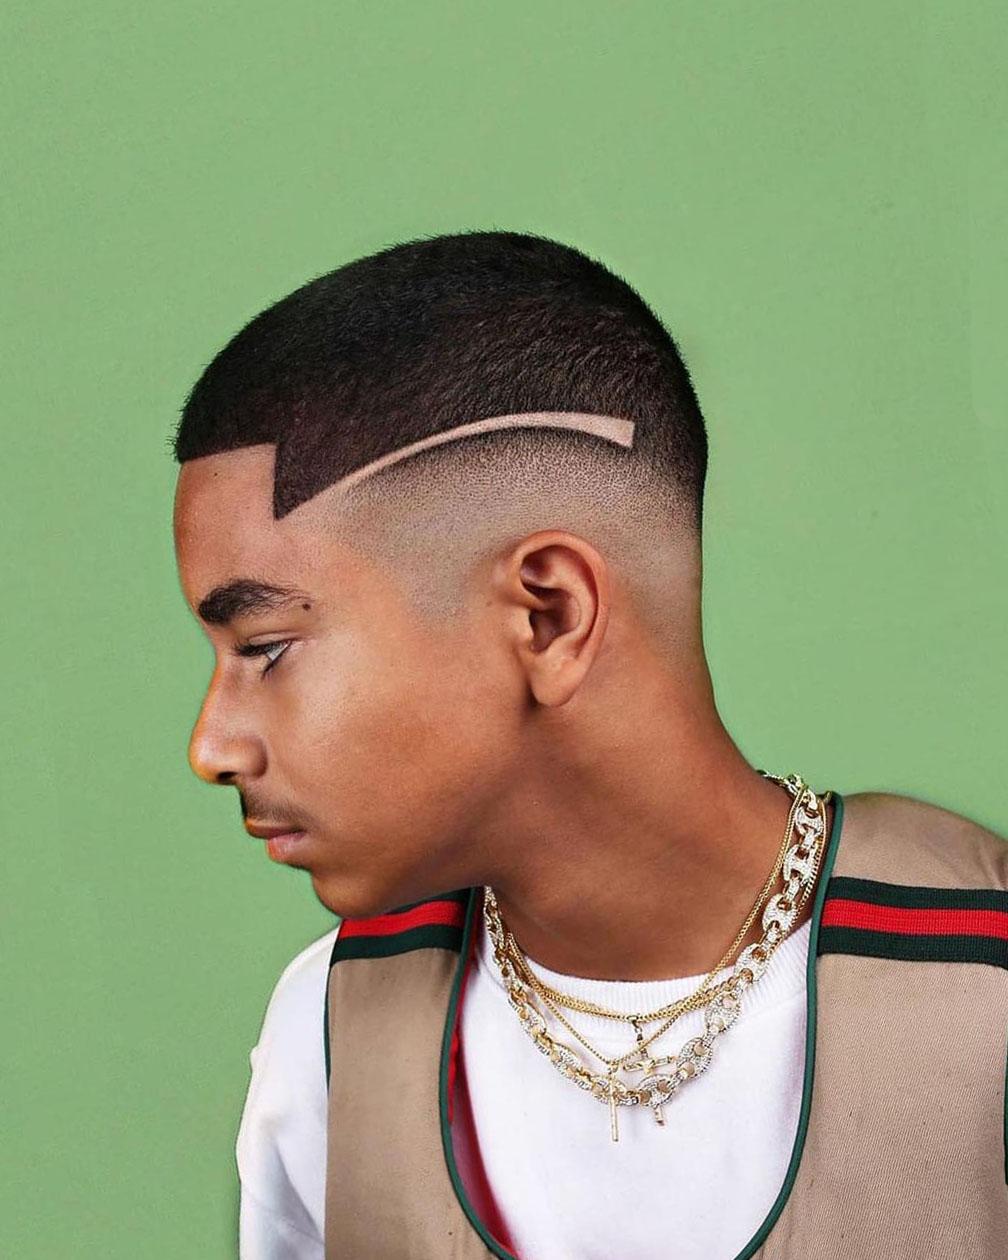 Black Guys Cropped Cut with Acute Angled Fringe